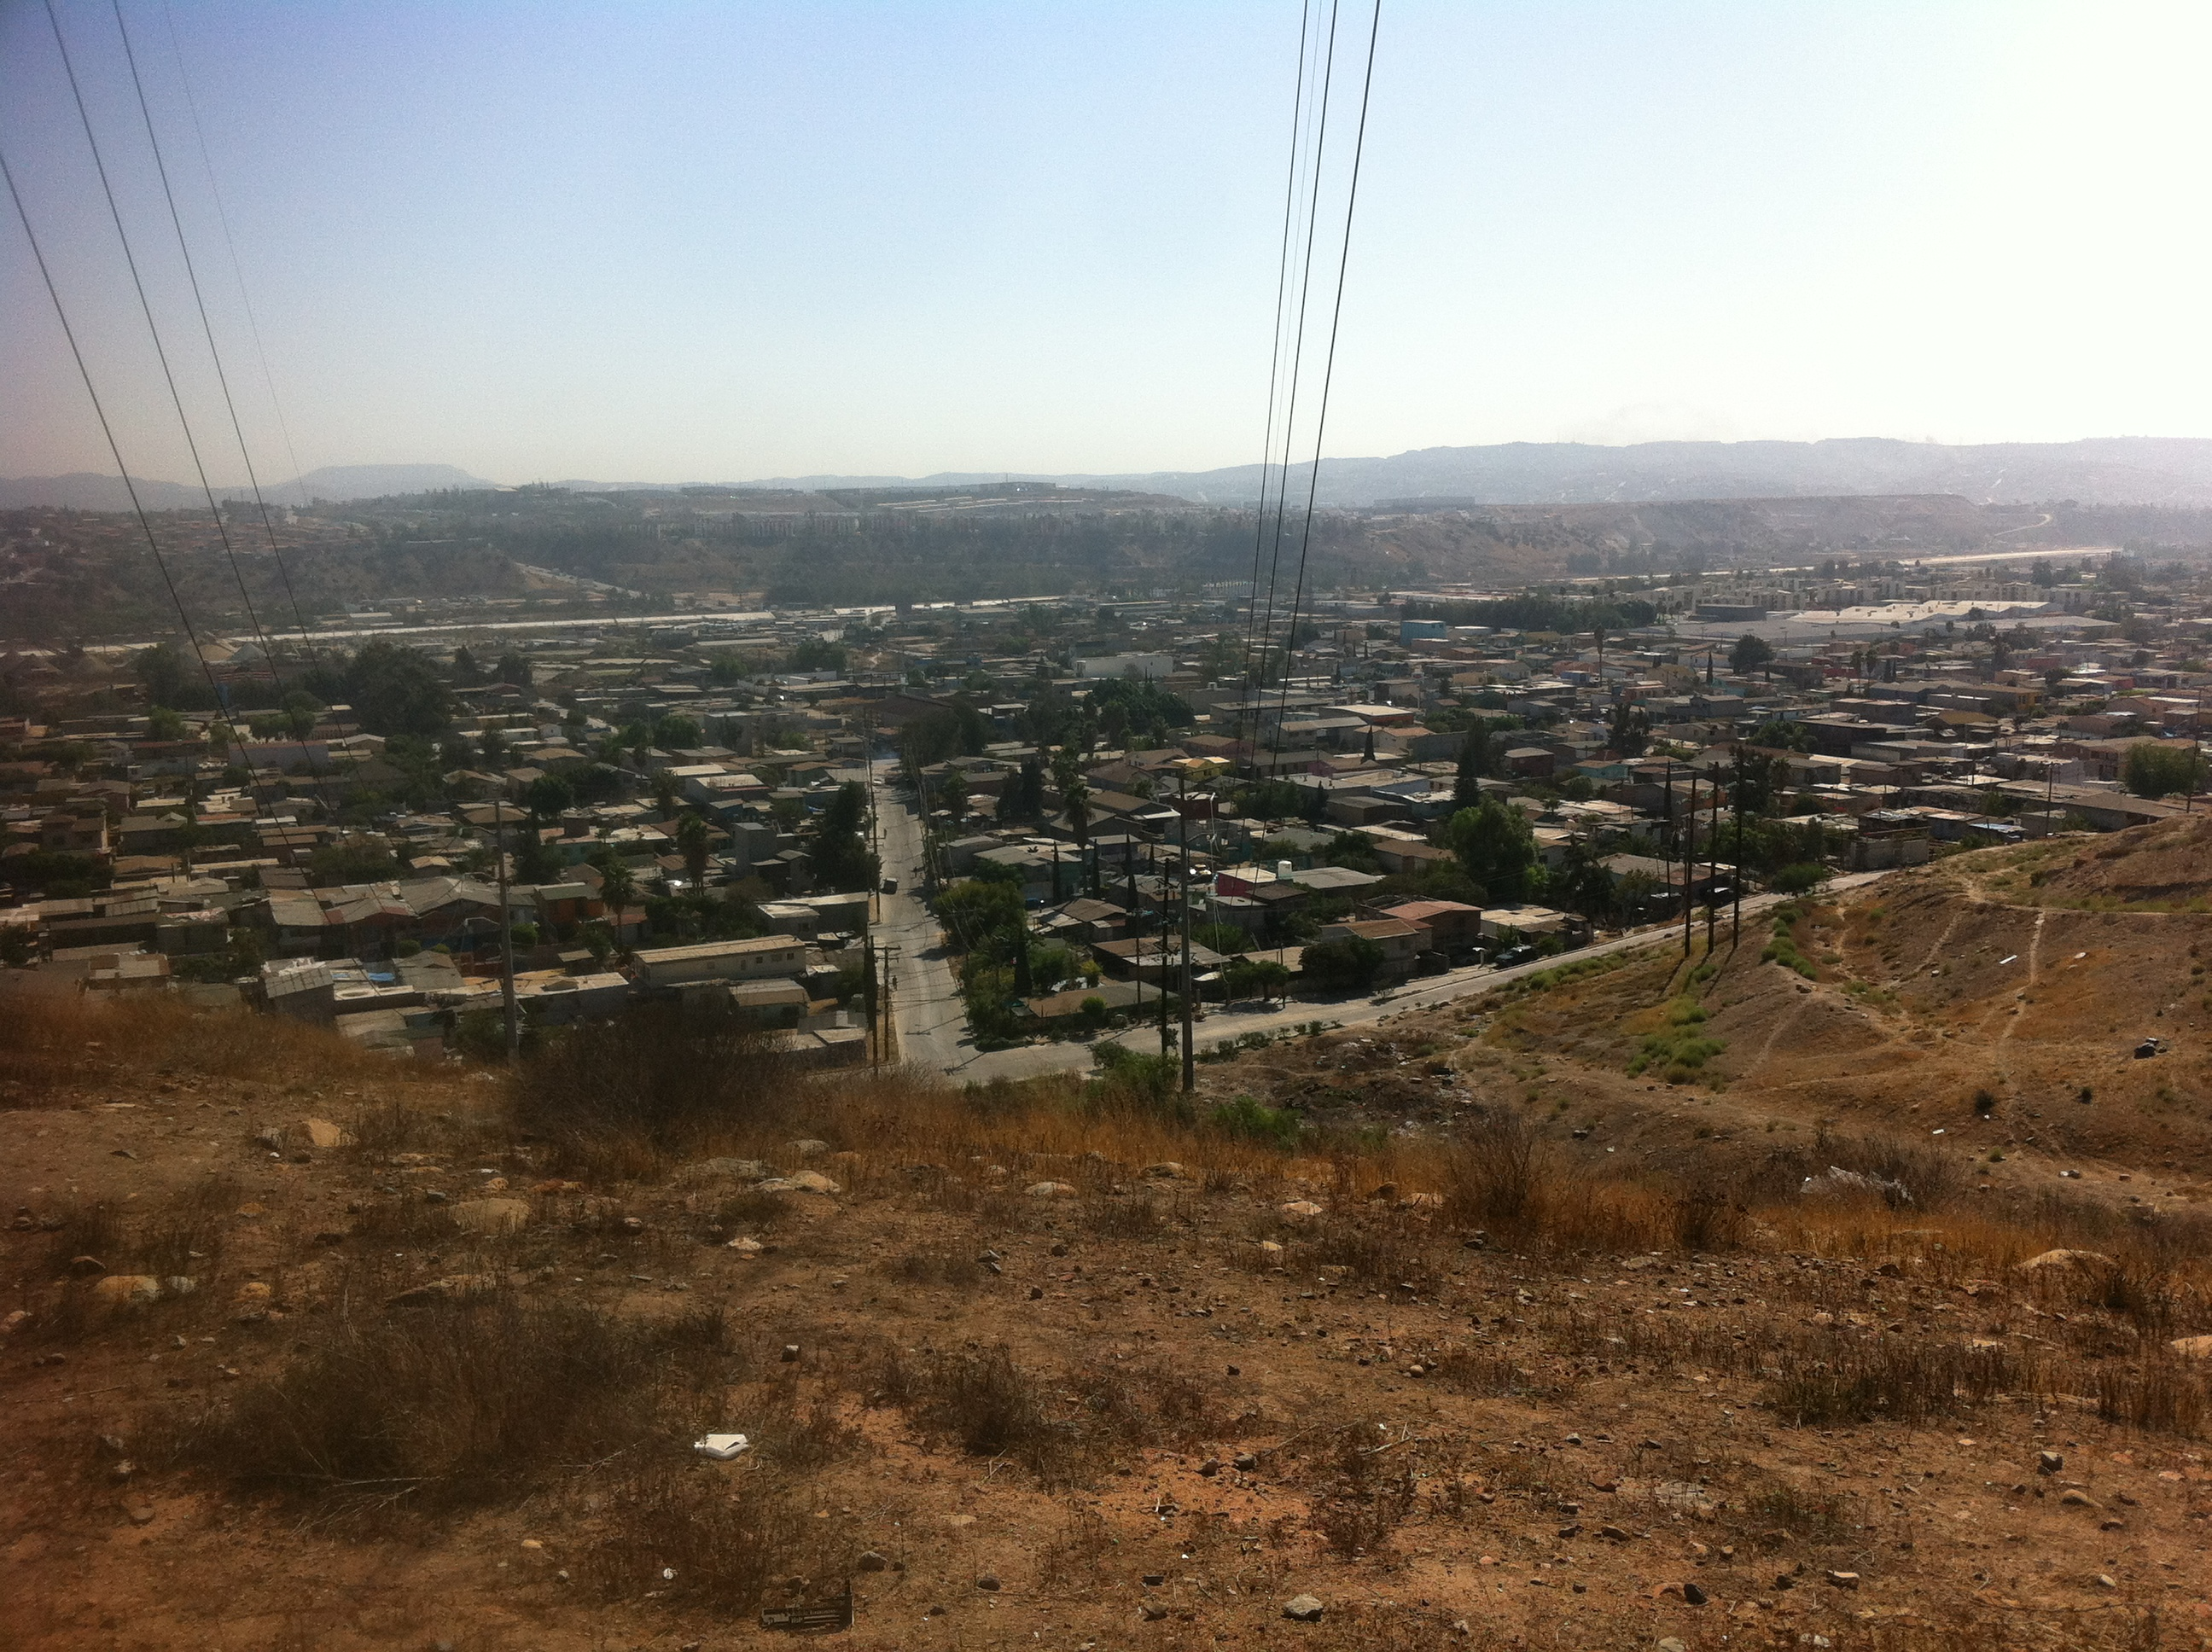 The Metales y Derivados site overlooks a working class neighborhood.